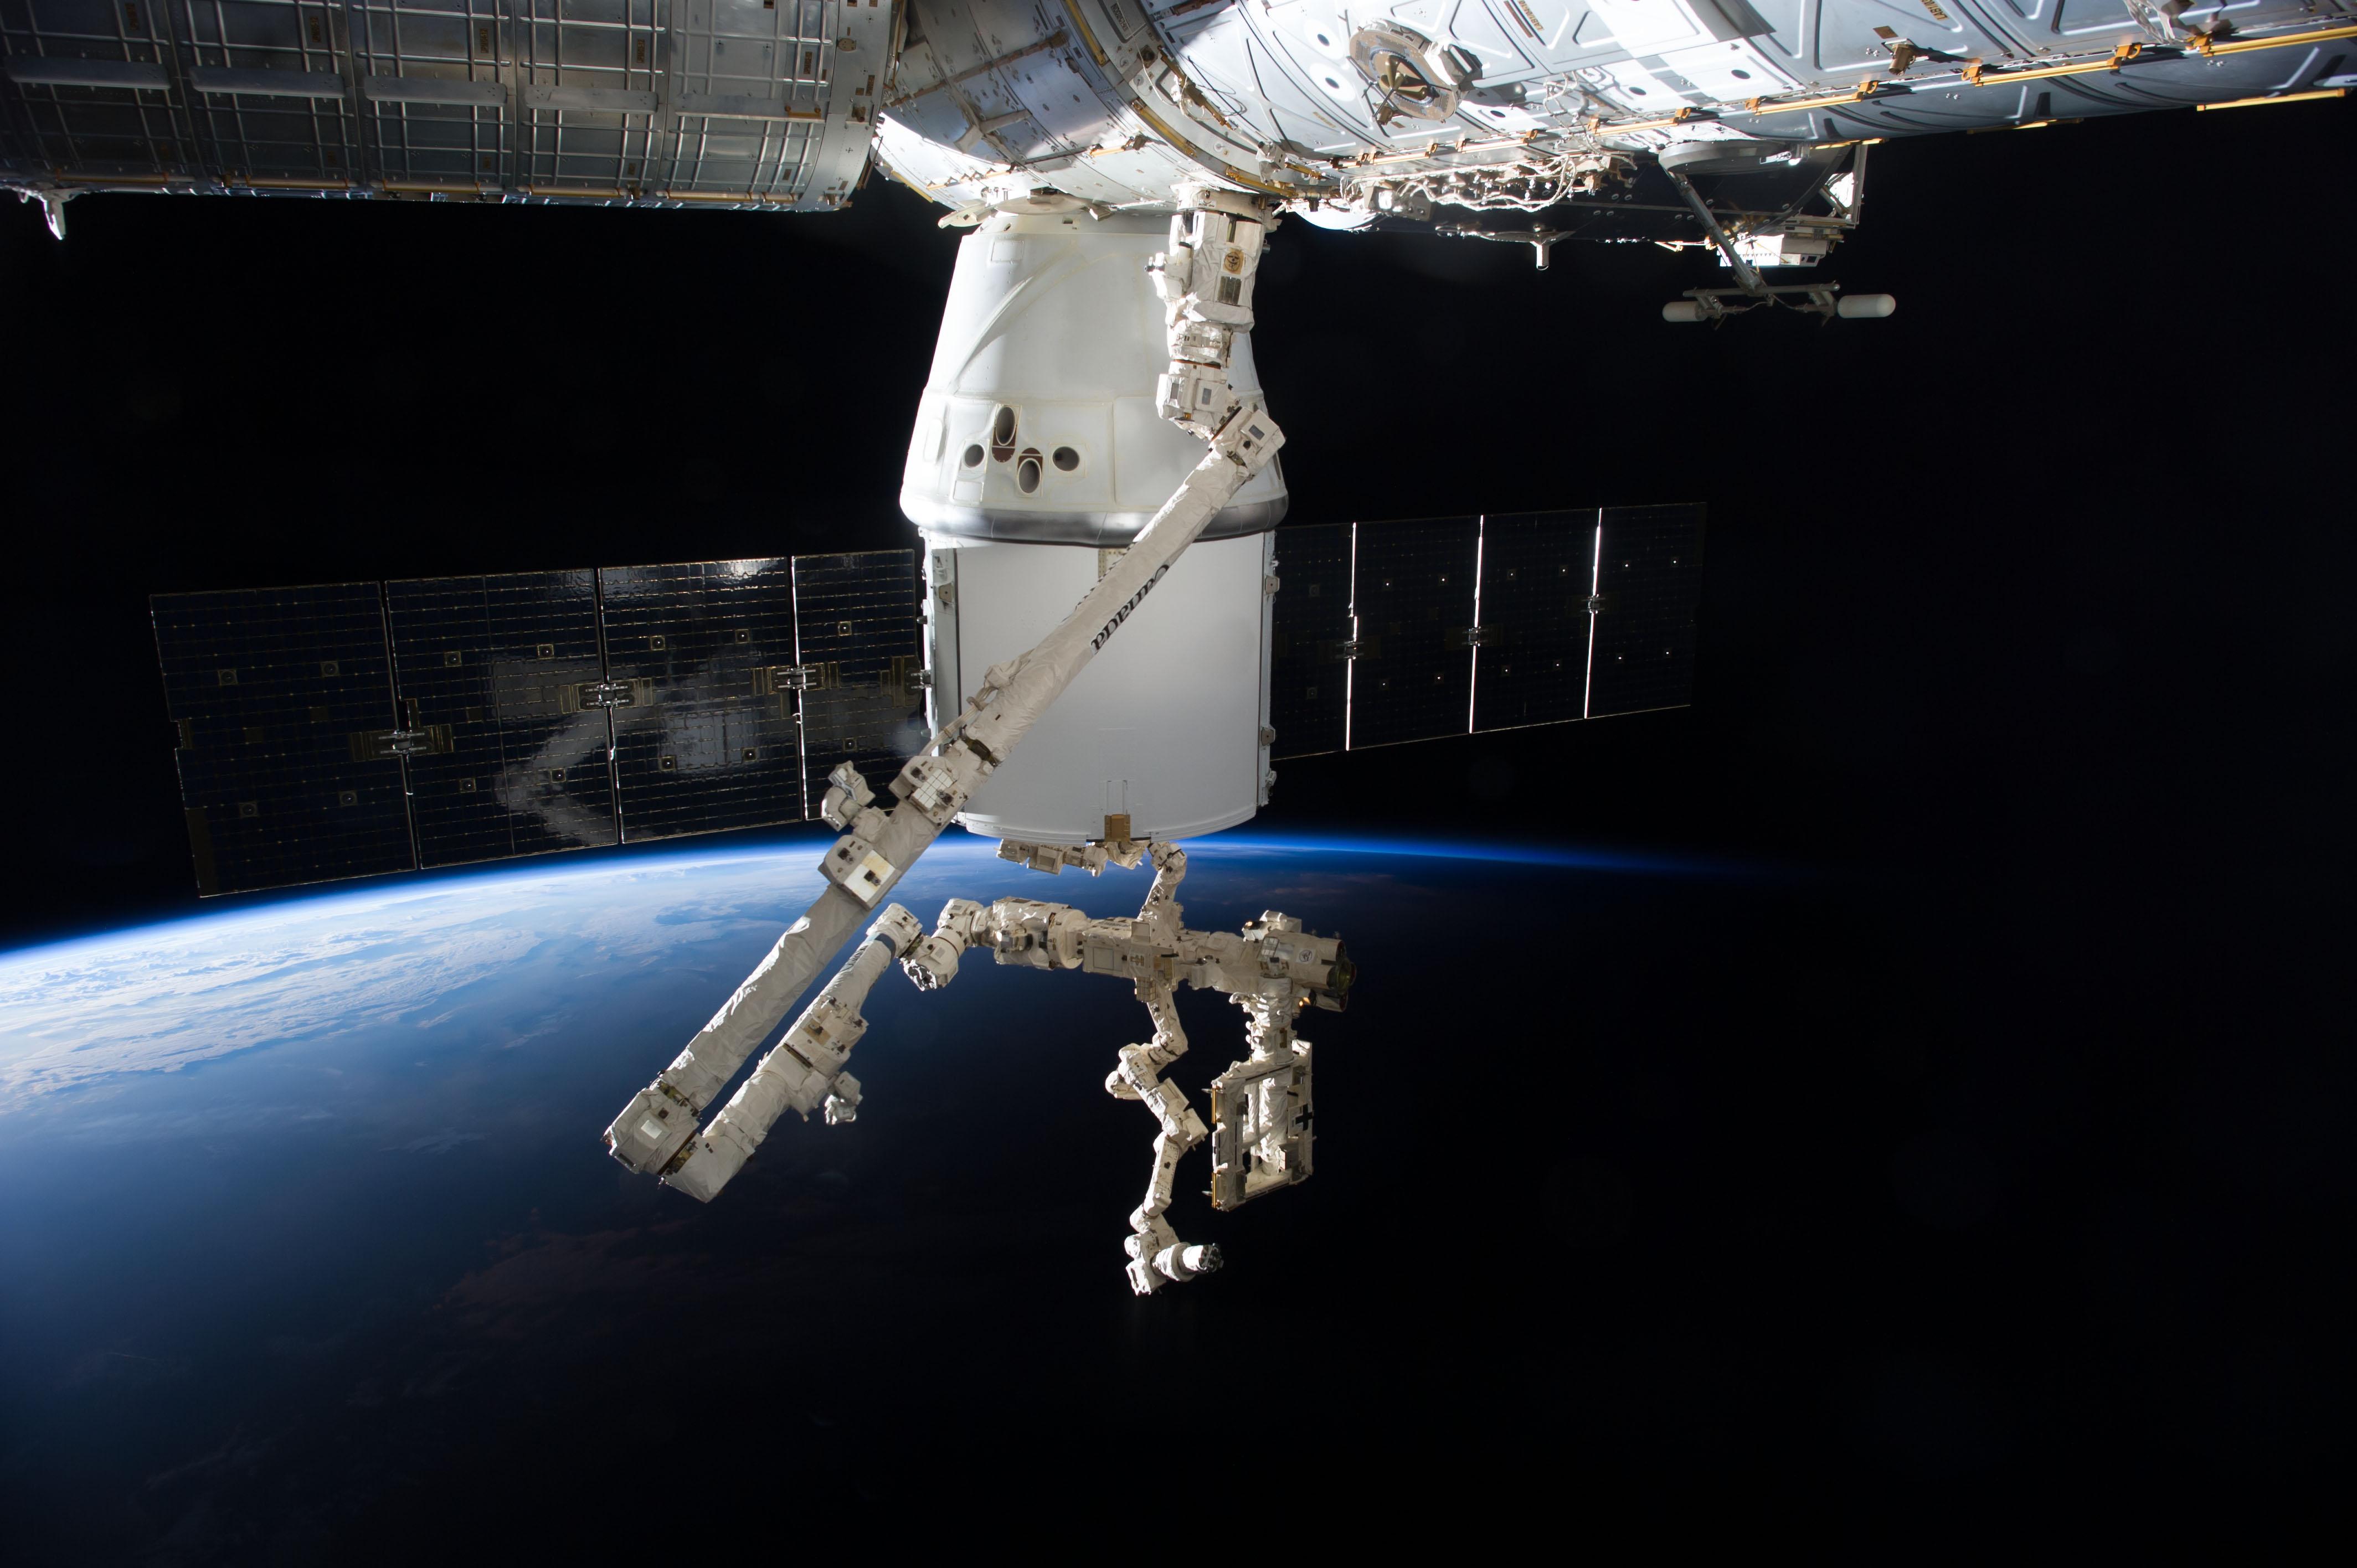 nass space station rocket - photo #38